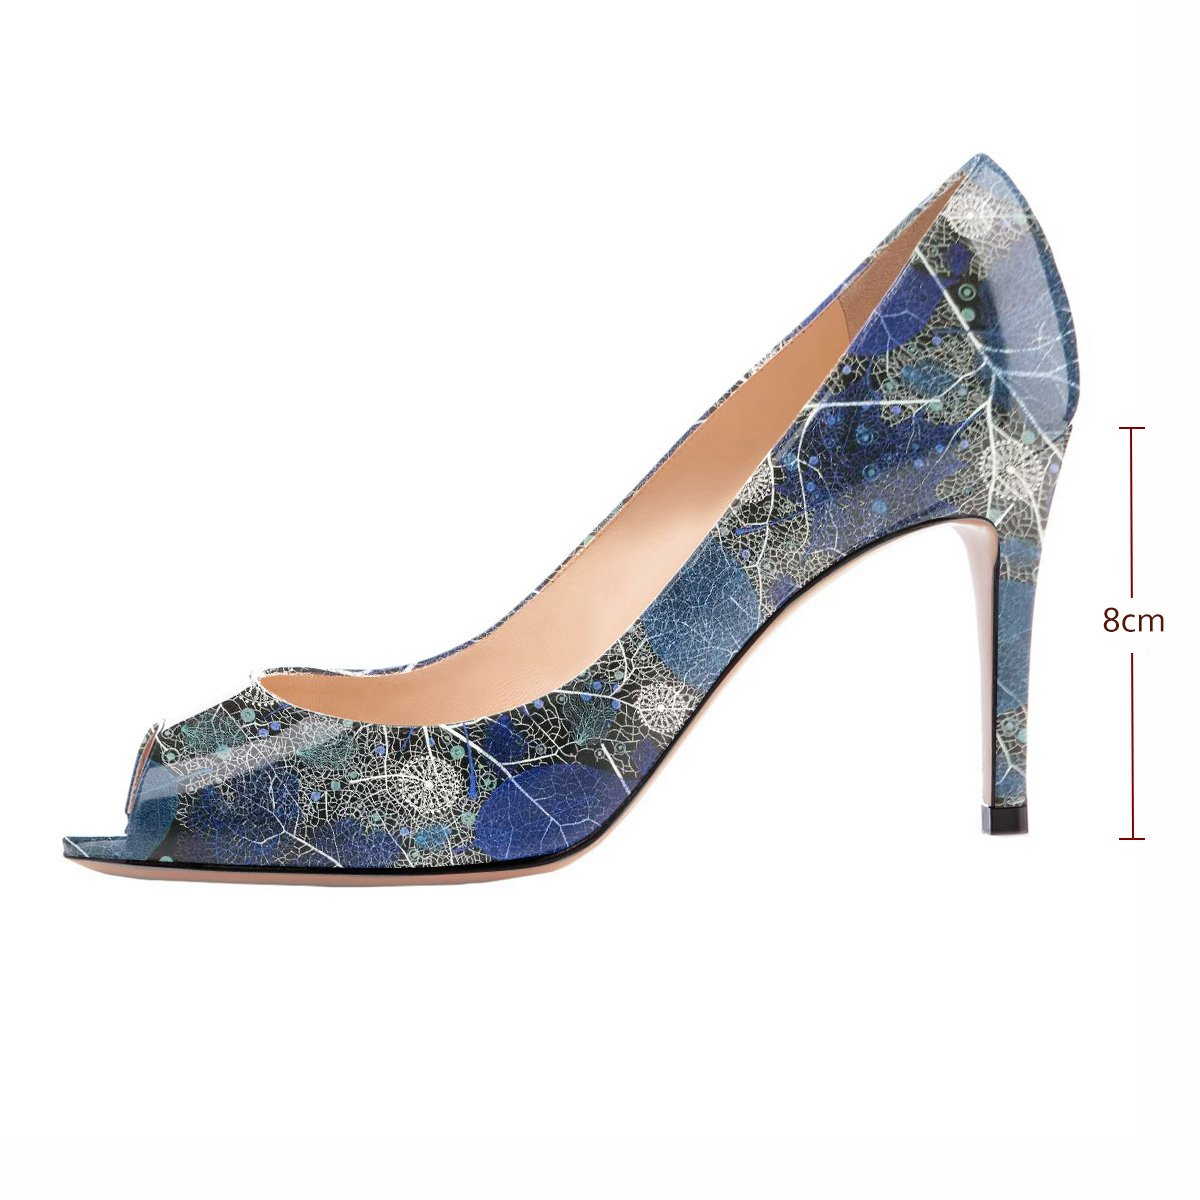 Eldof Women Peep Toe Pumps Mid-Heel Pumps Formal Wedding Bridal Classic Heel Open Toe Stiletto B07F8PDVCW 13 B(M) US|Blue-leaf